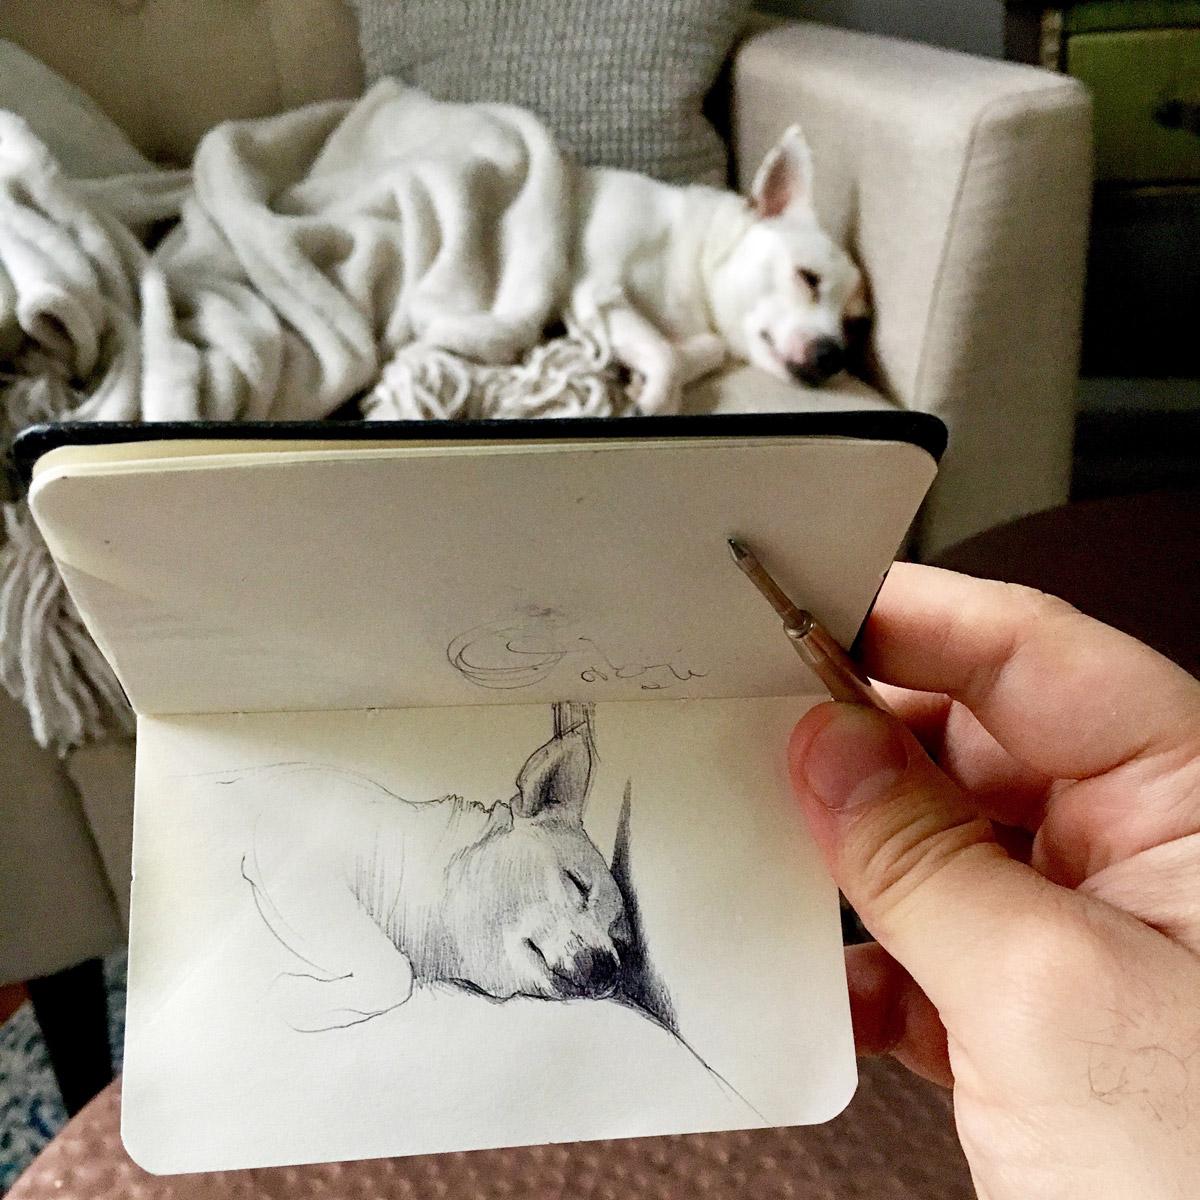 Incredible Ballpoint Pen Drawings By Artist Nicolas V Sanchez